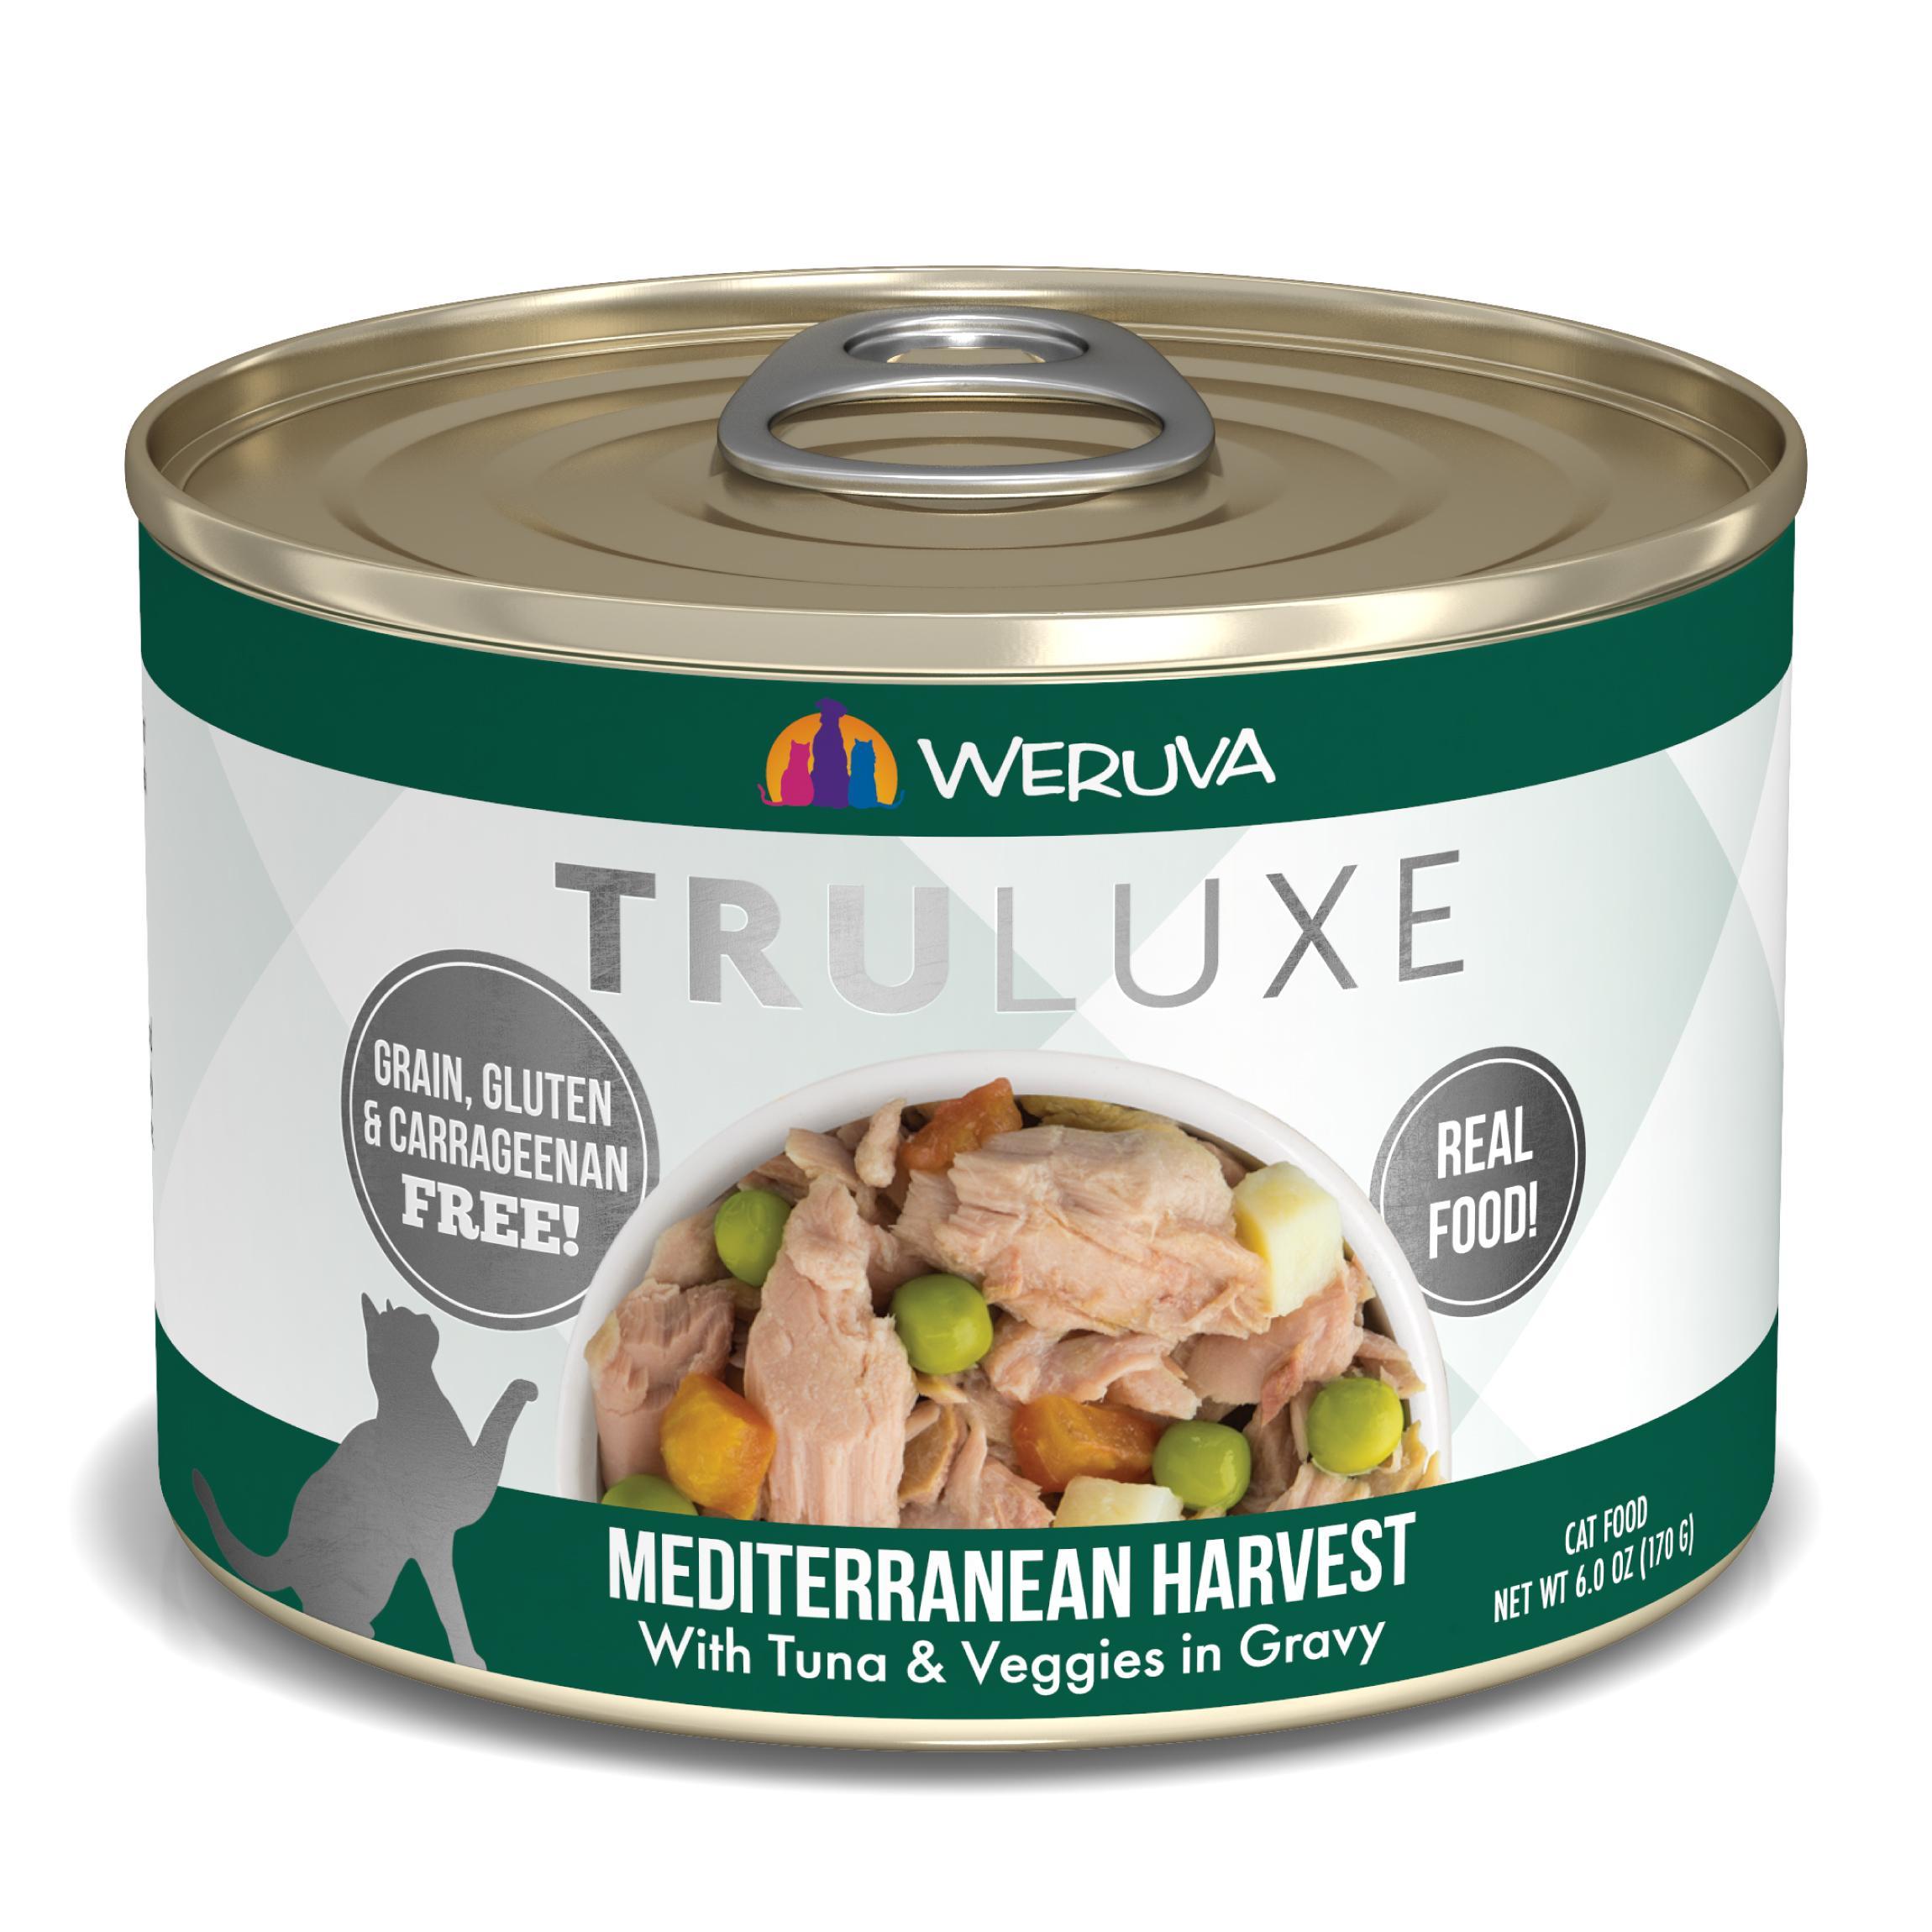 Weruva Cat Truluxe Mediterranean Harvest with Tuna & Veggies in Gravy Grain-Free Wet Cat Food, 6-oz